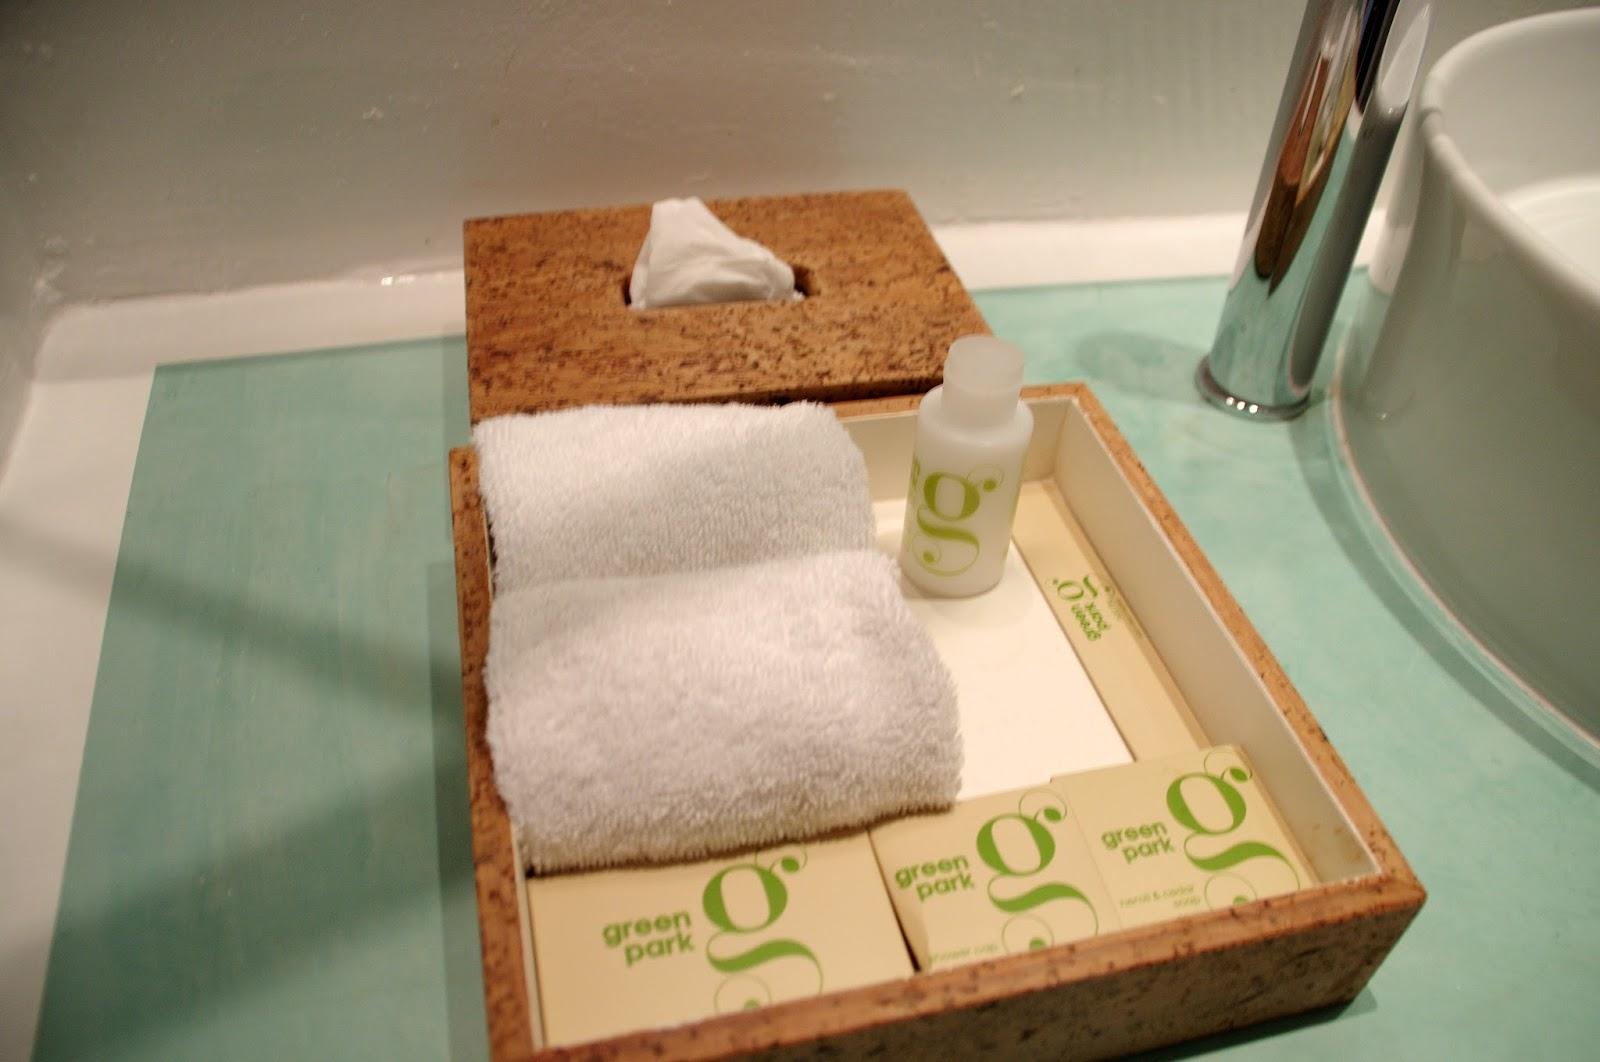 Vila Monte Farm House Portugal Bathroom toiletries